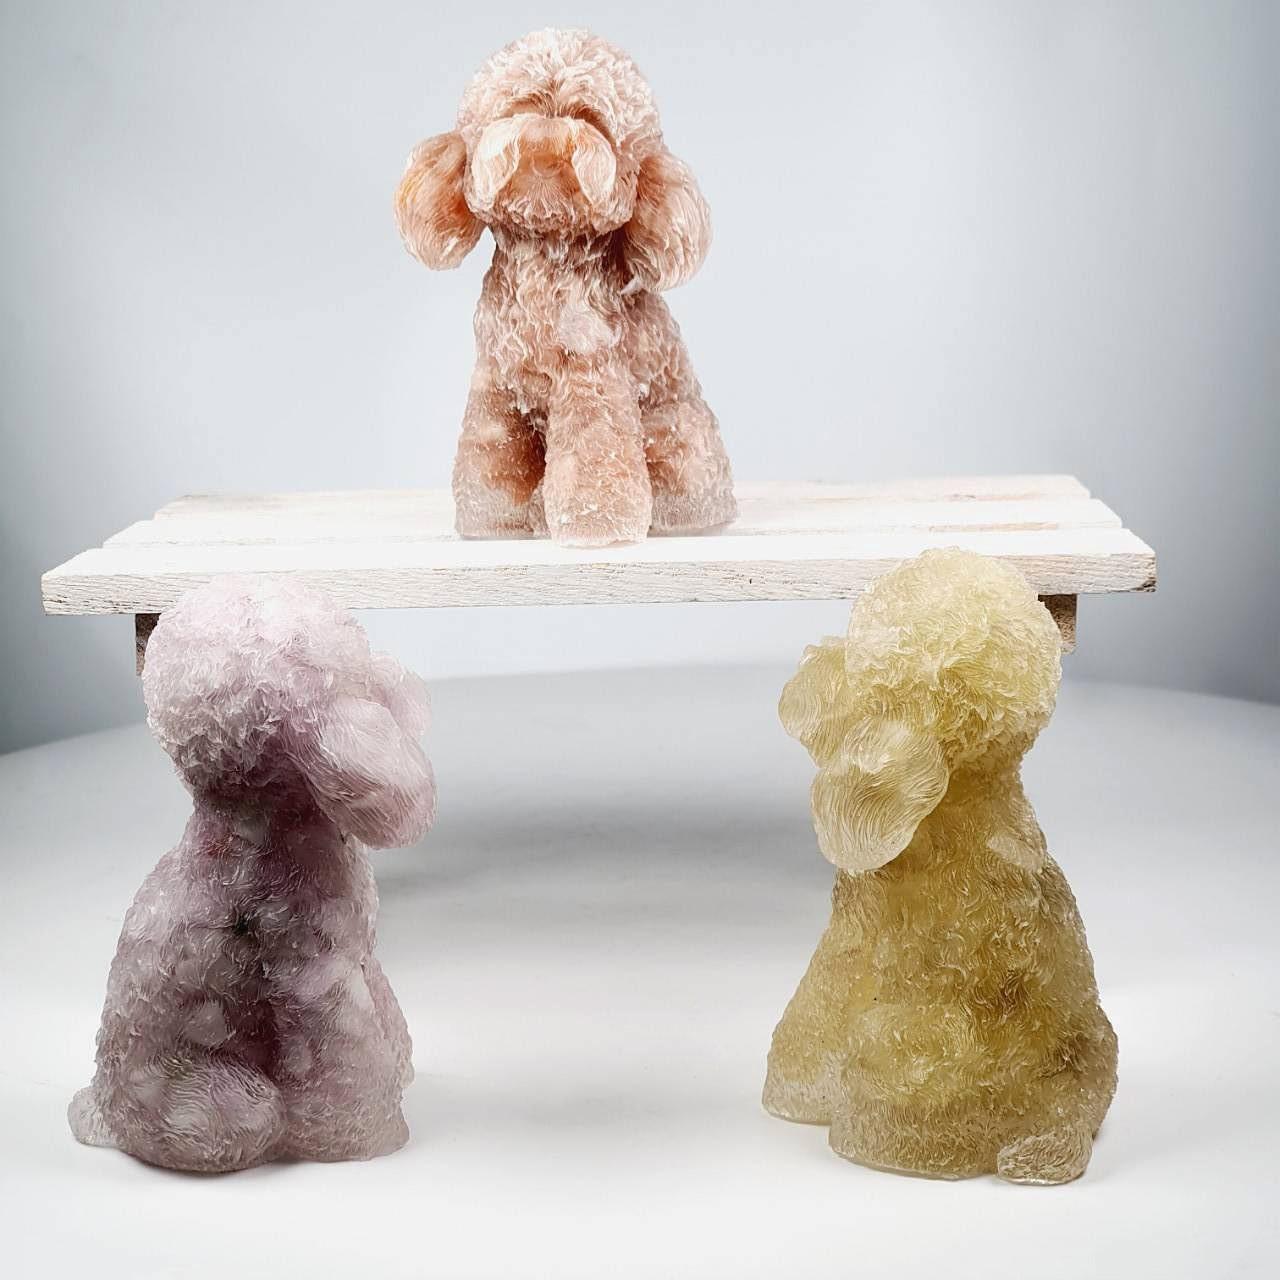 Teddy Poodle Crystal Decoration - Intro